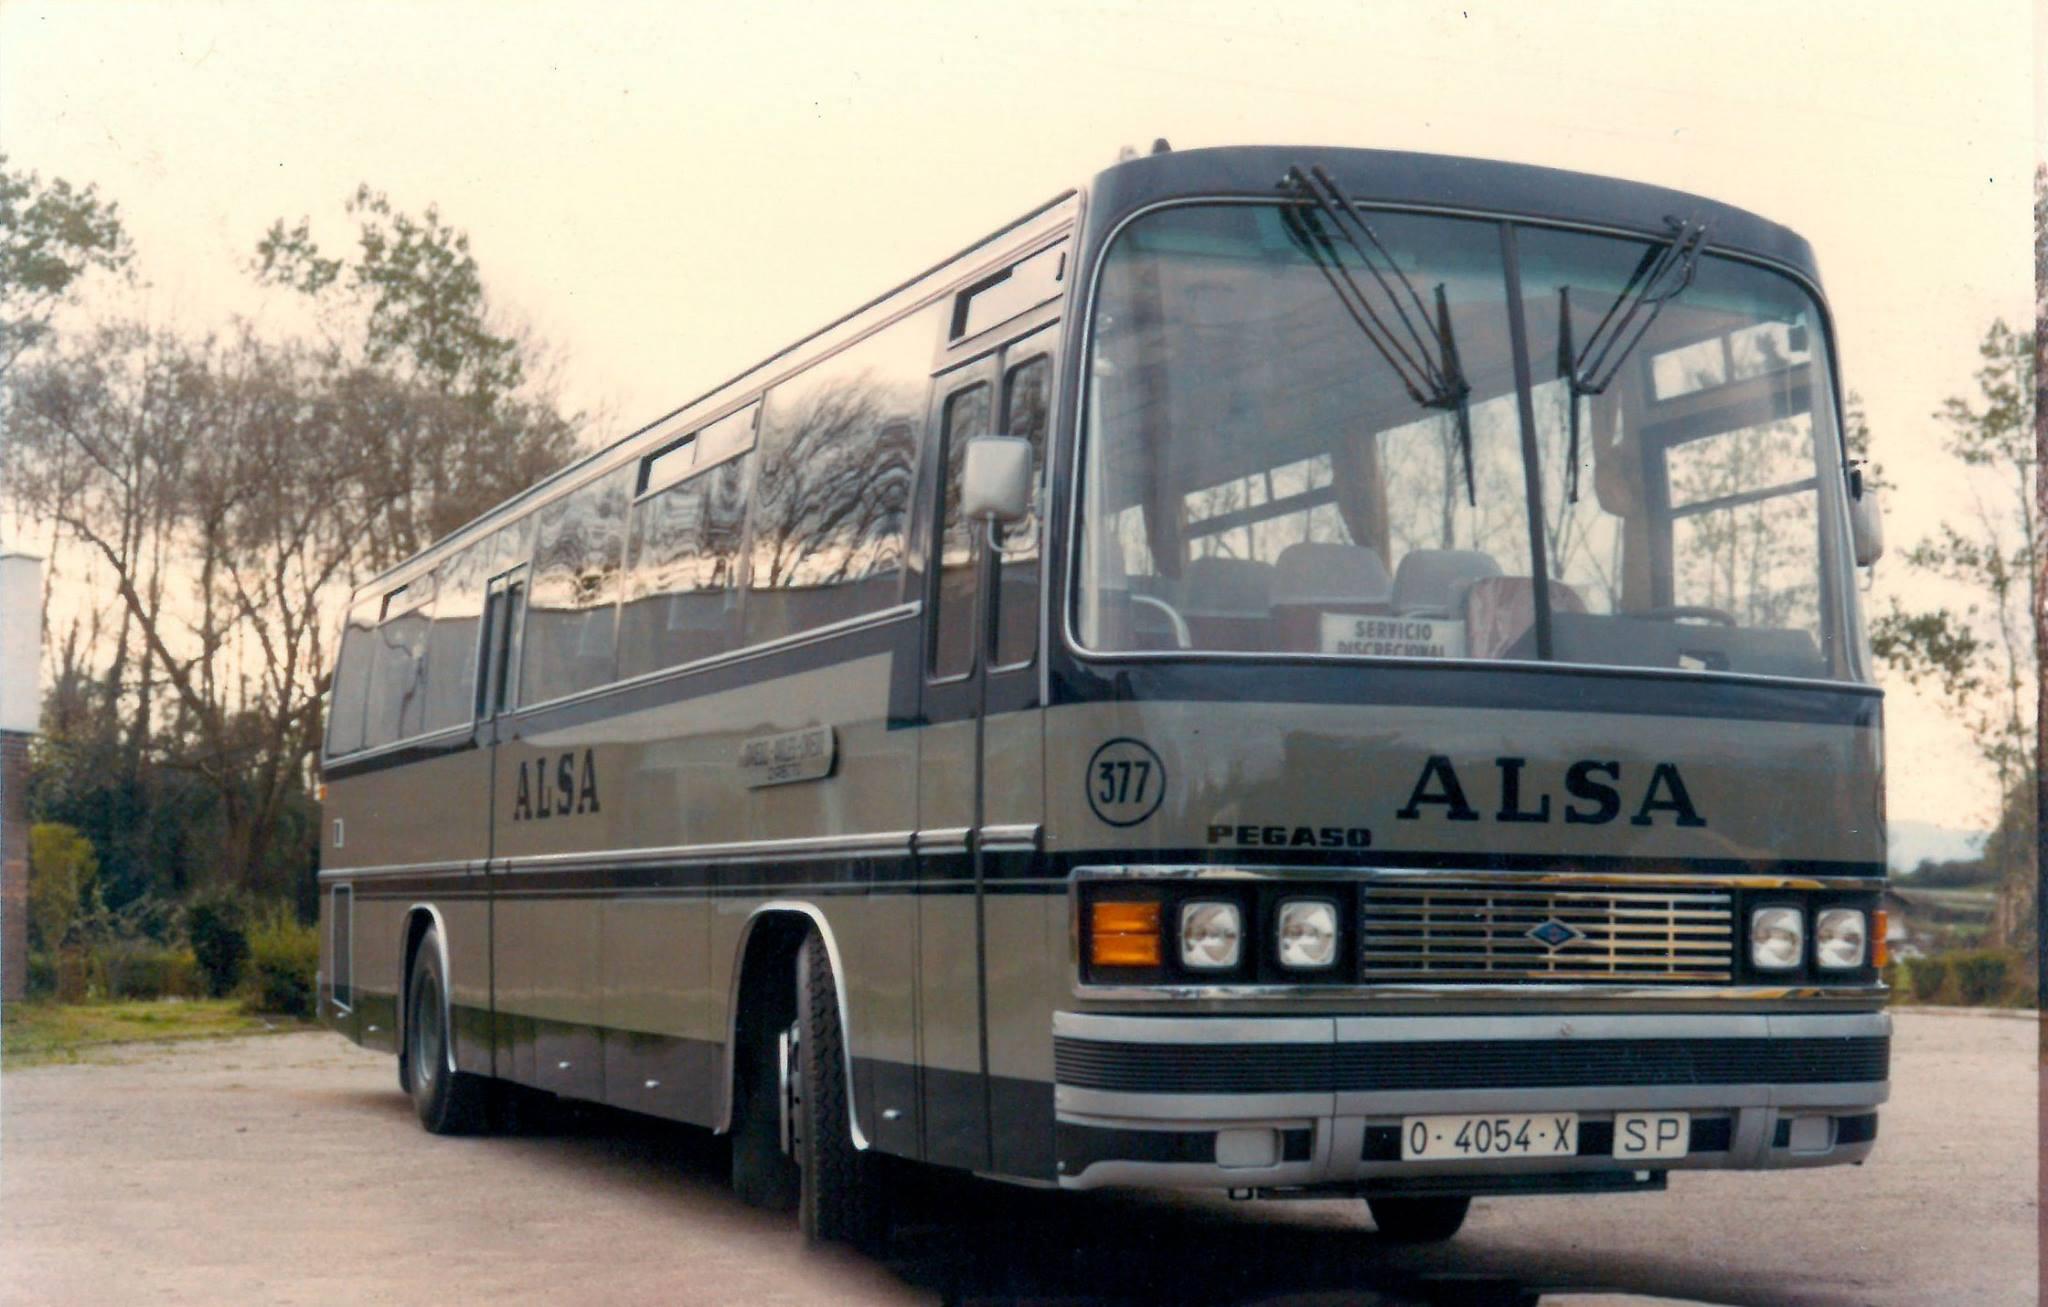 pegaso-carr-voor-Alsa-november-1981-1